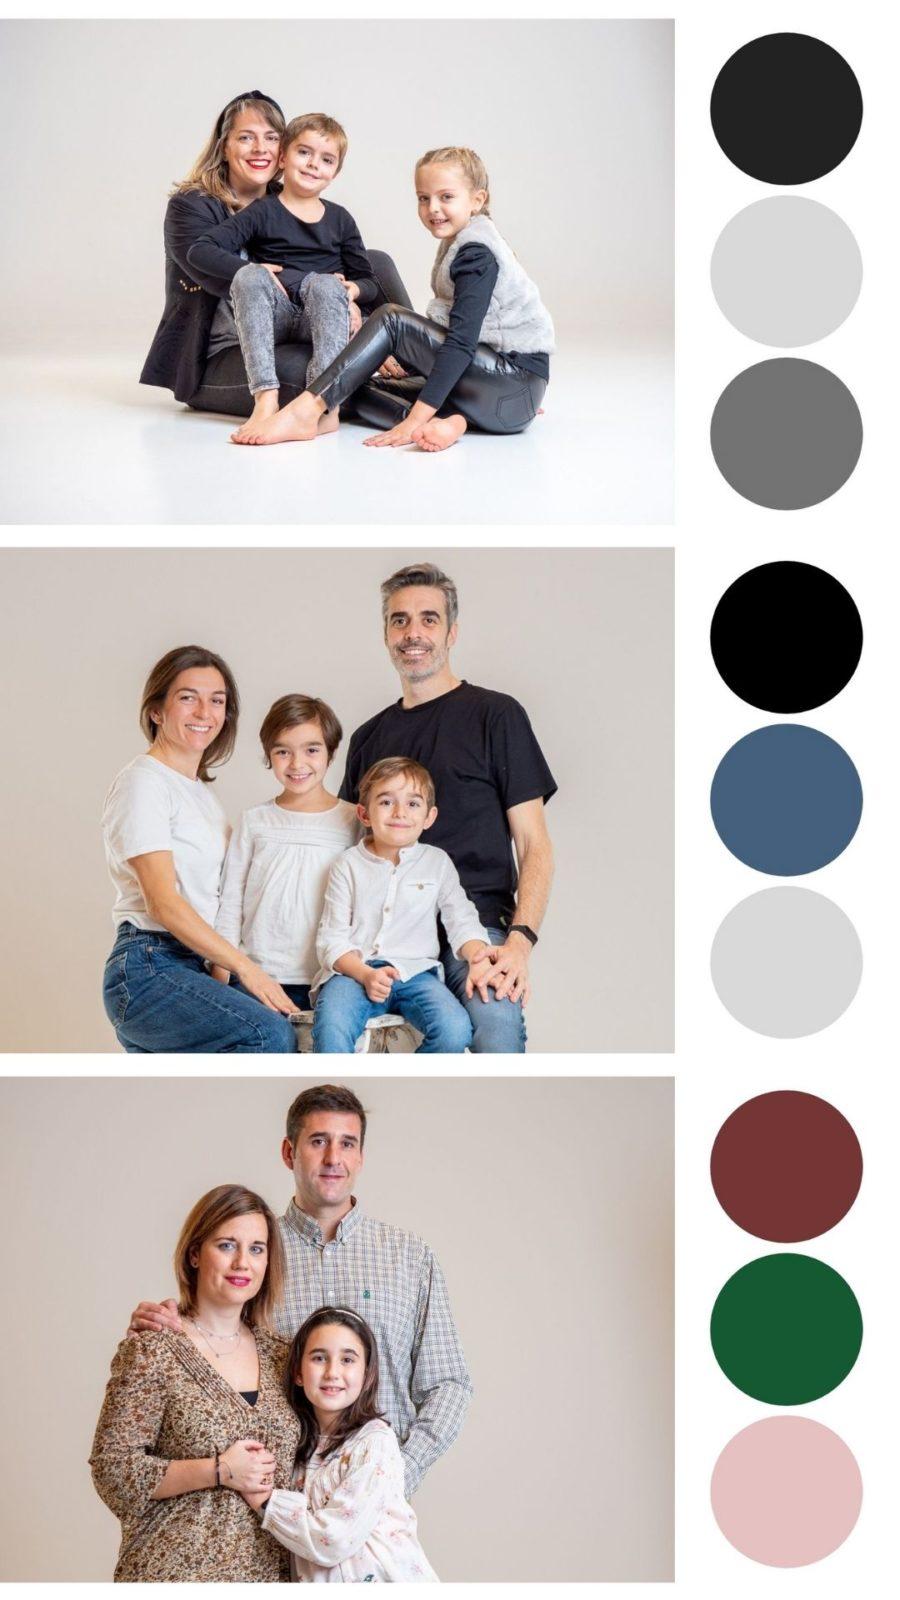 elegir ropa para sesión de fotos de familia